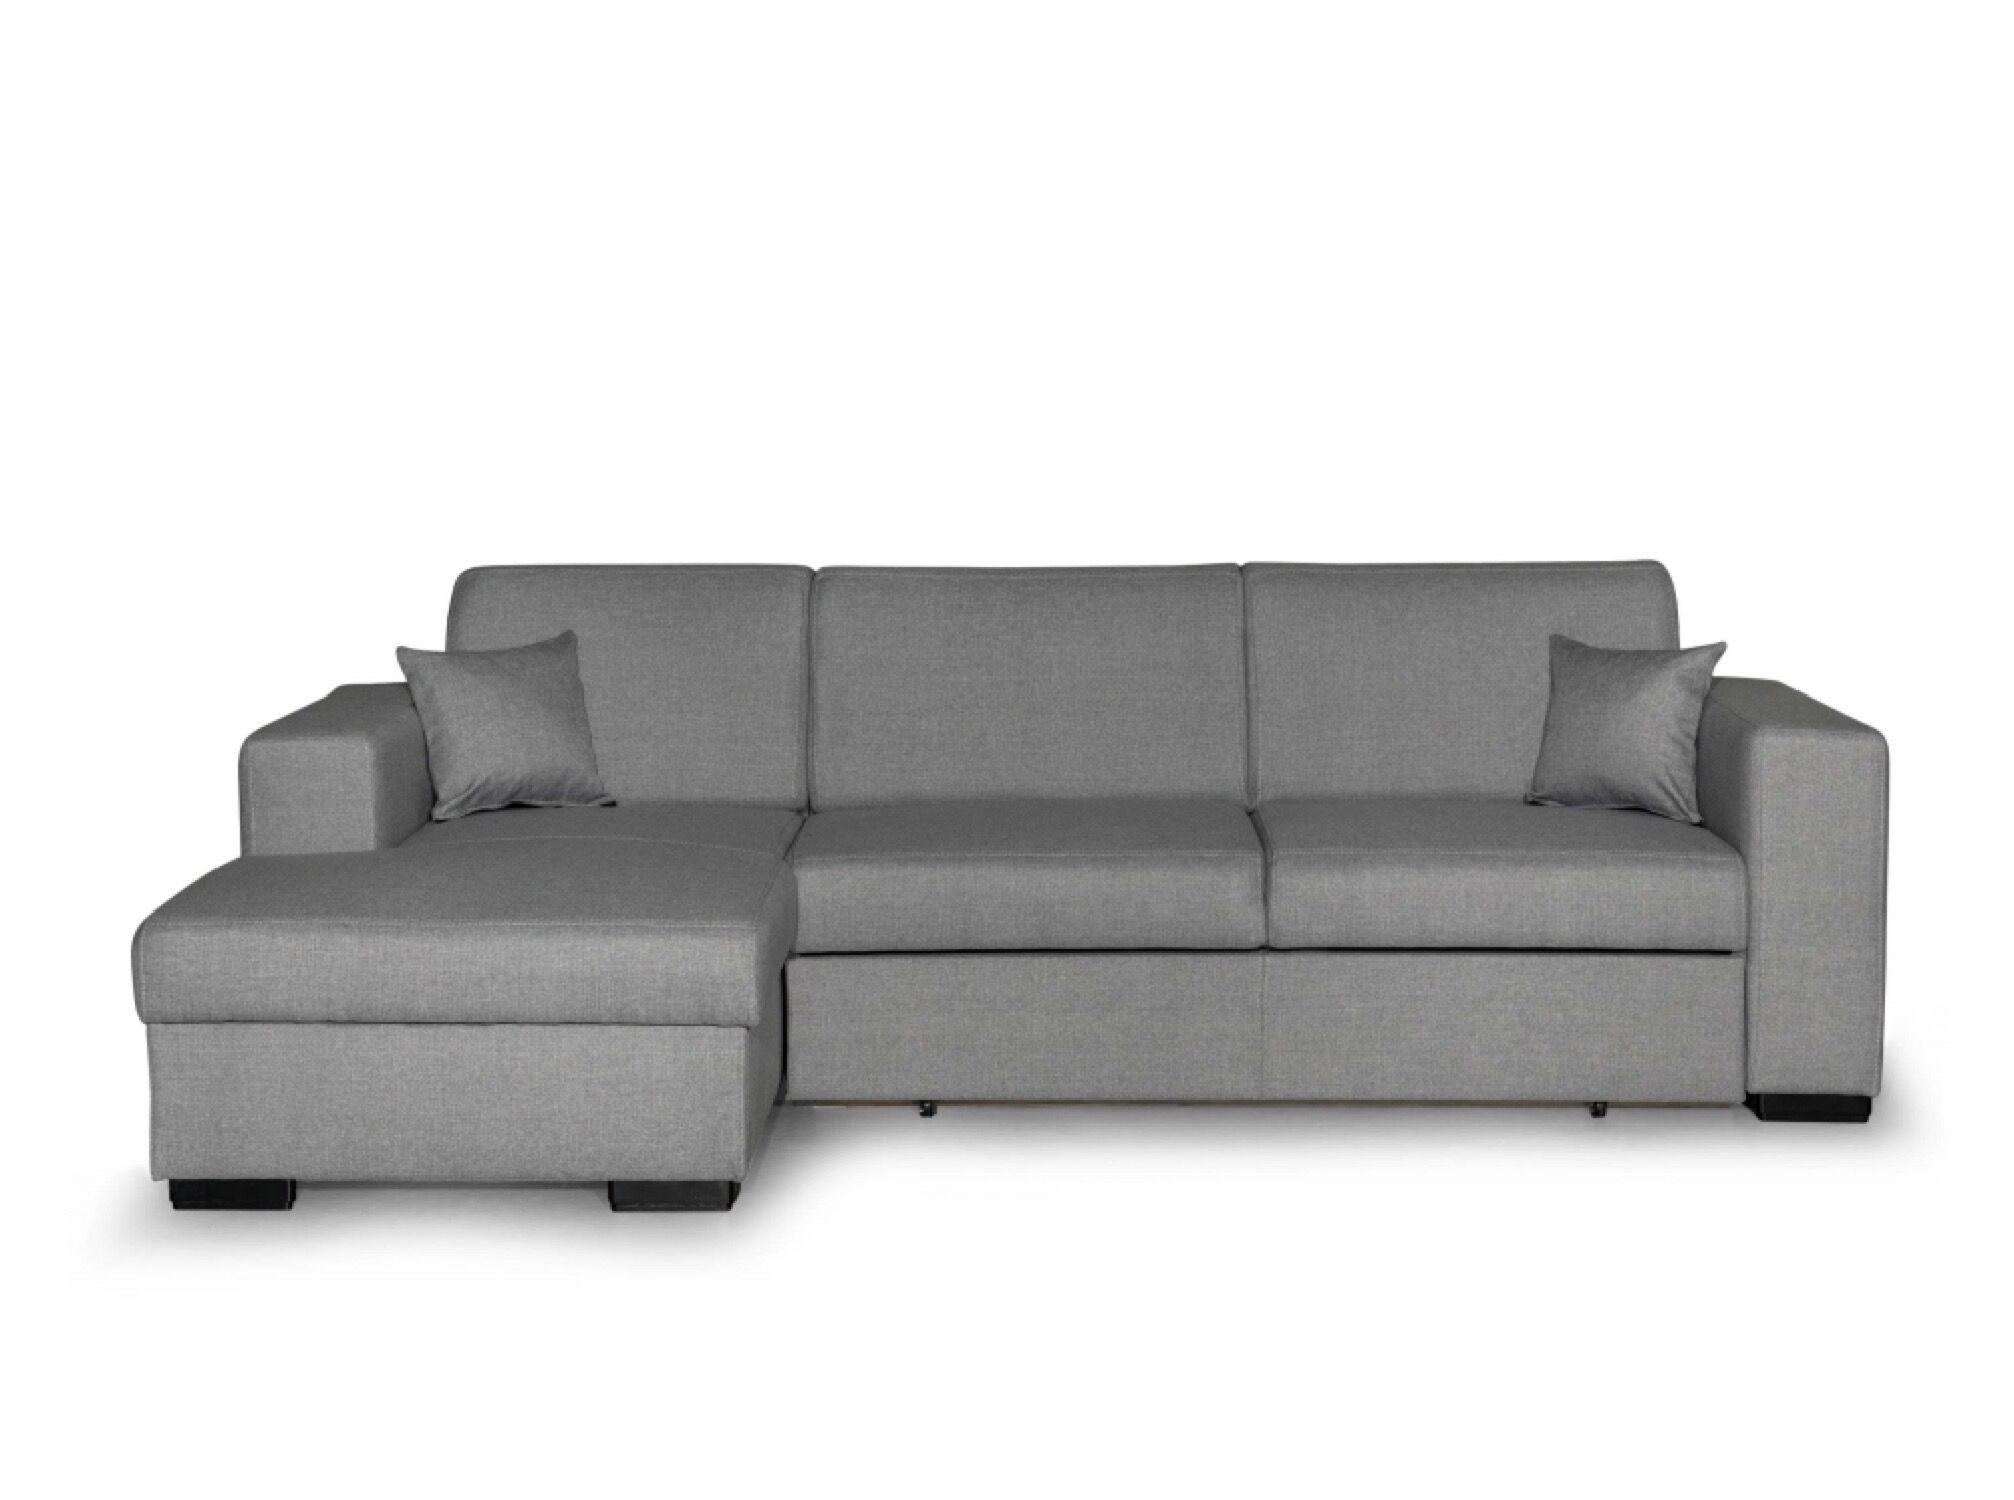 Usinestreet Canapé d'angle gauche convertible en tissu gris clair